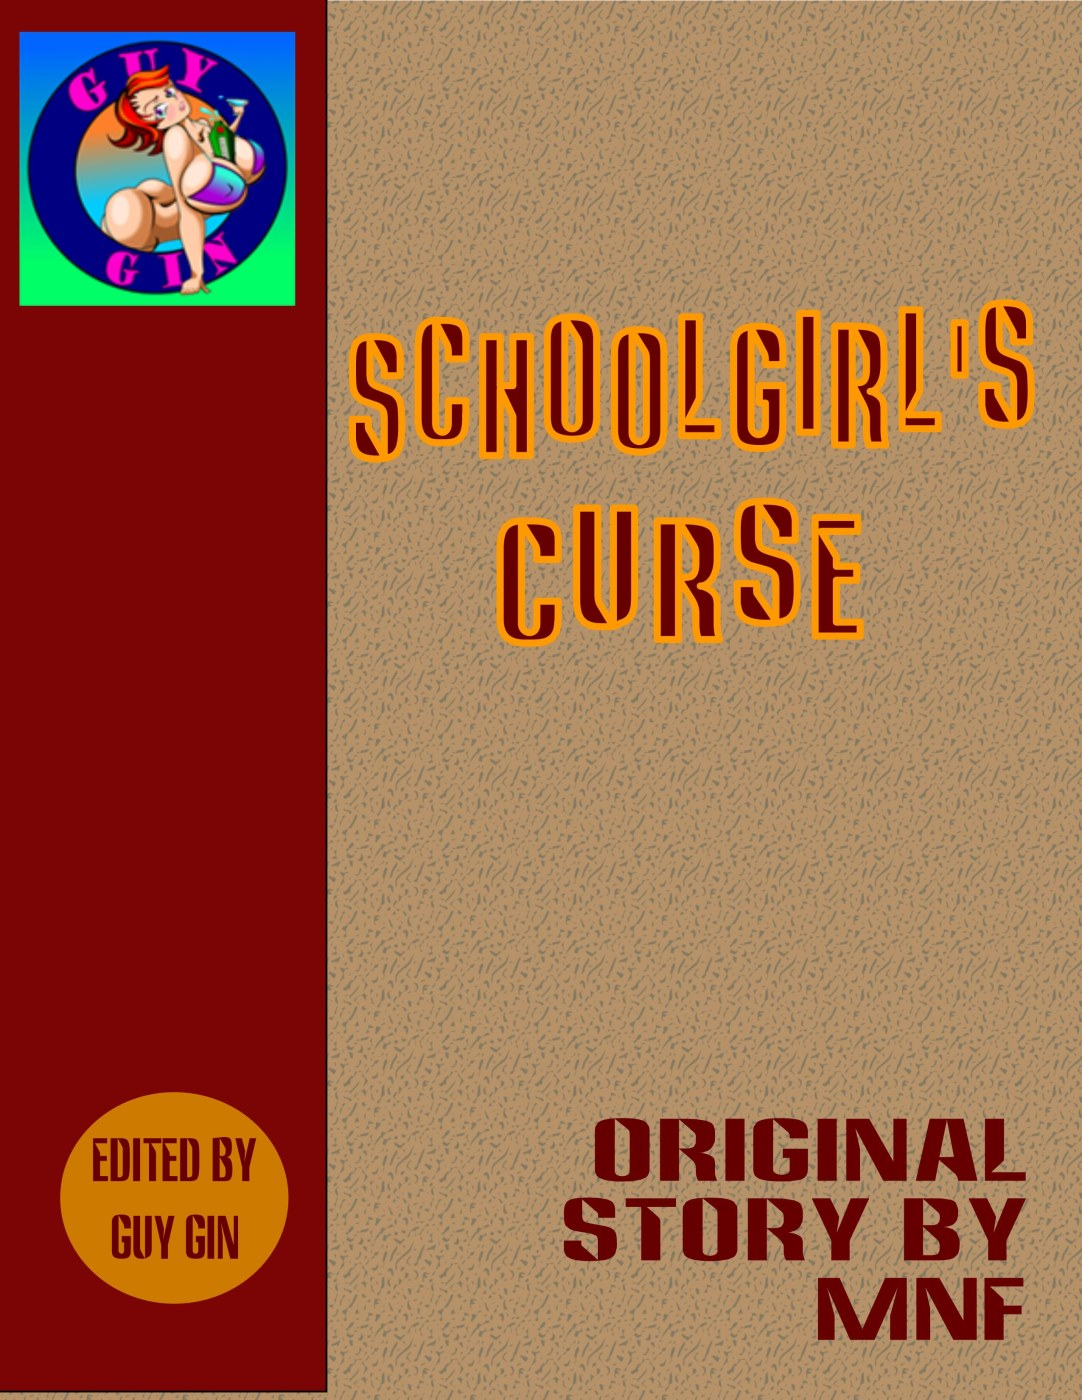 Porn Comics - School Girl Curse 1 (GuyGin Remix) porn comics 8 muses